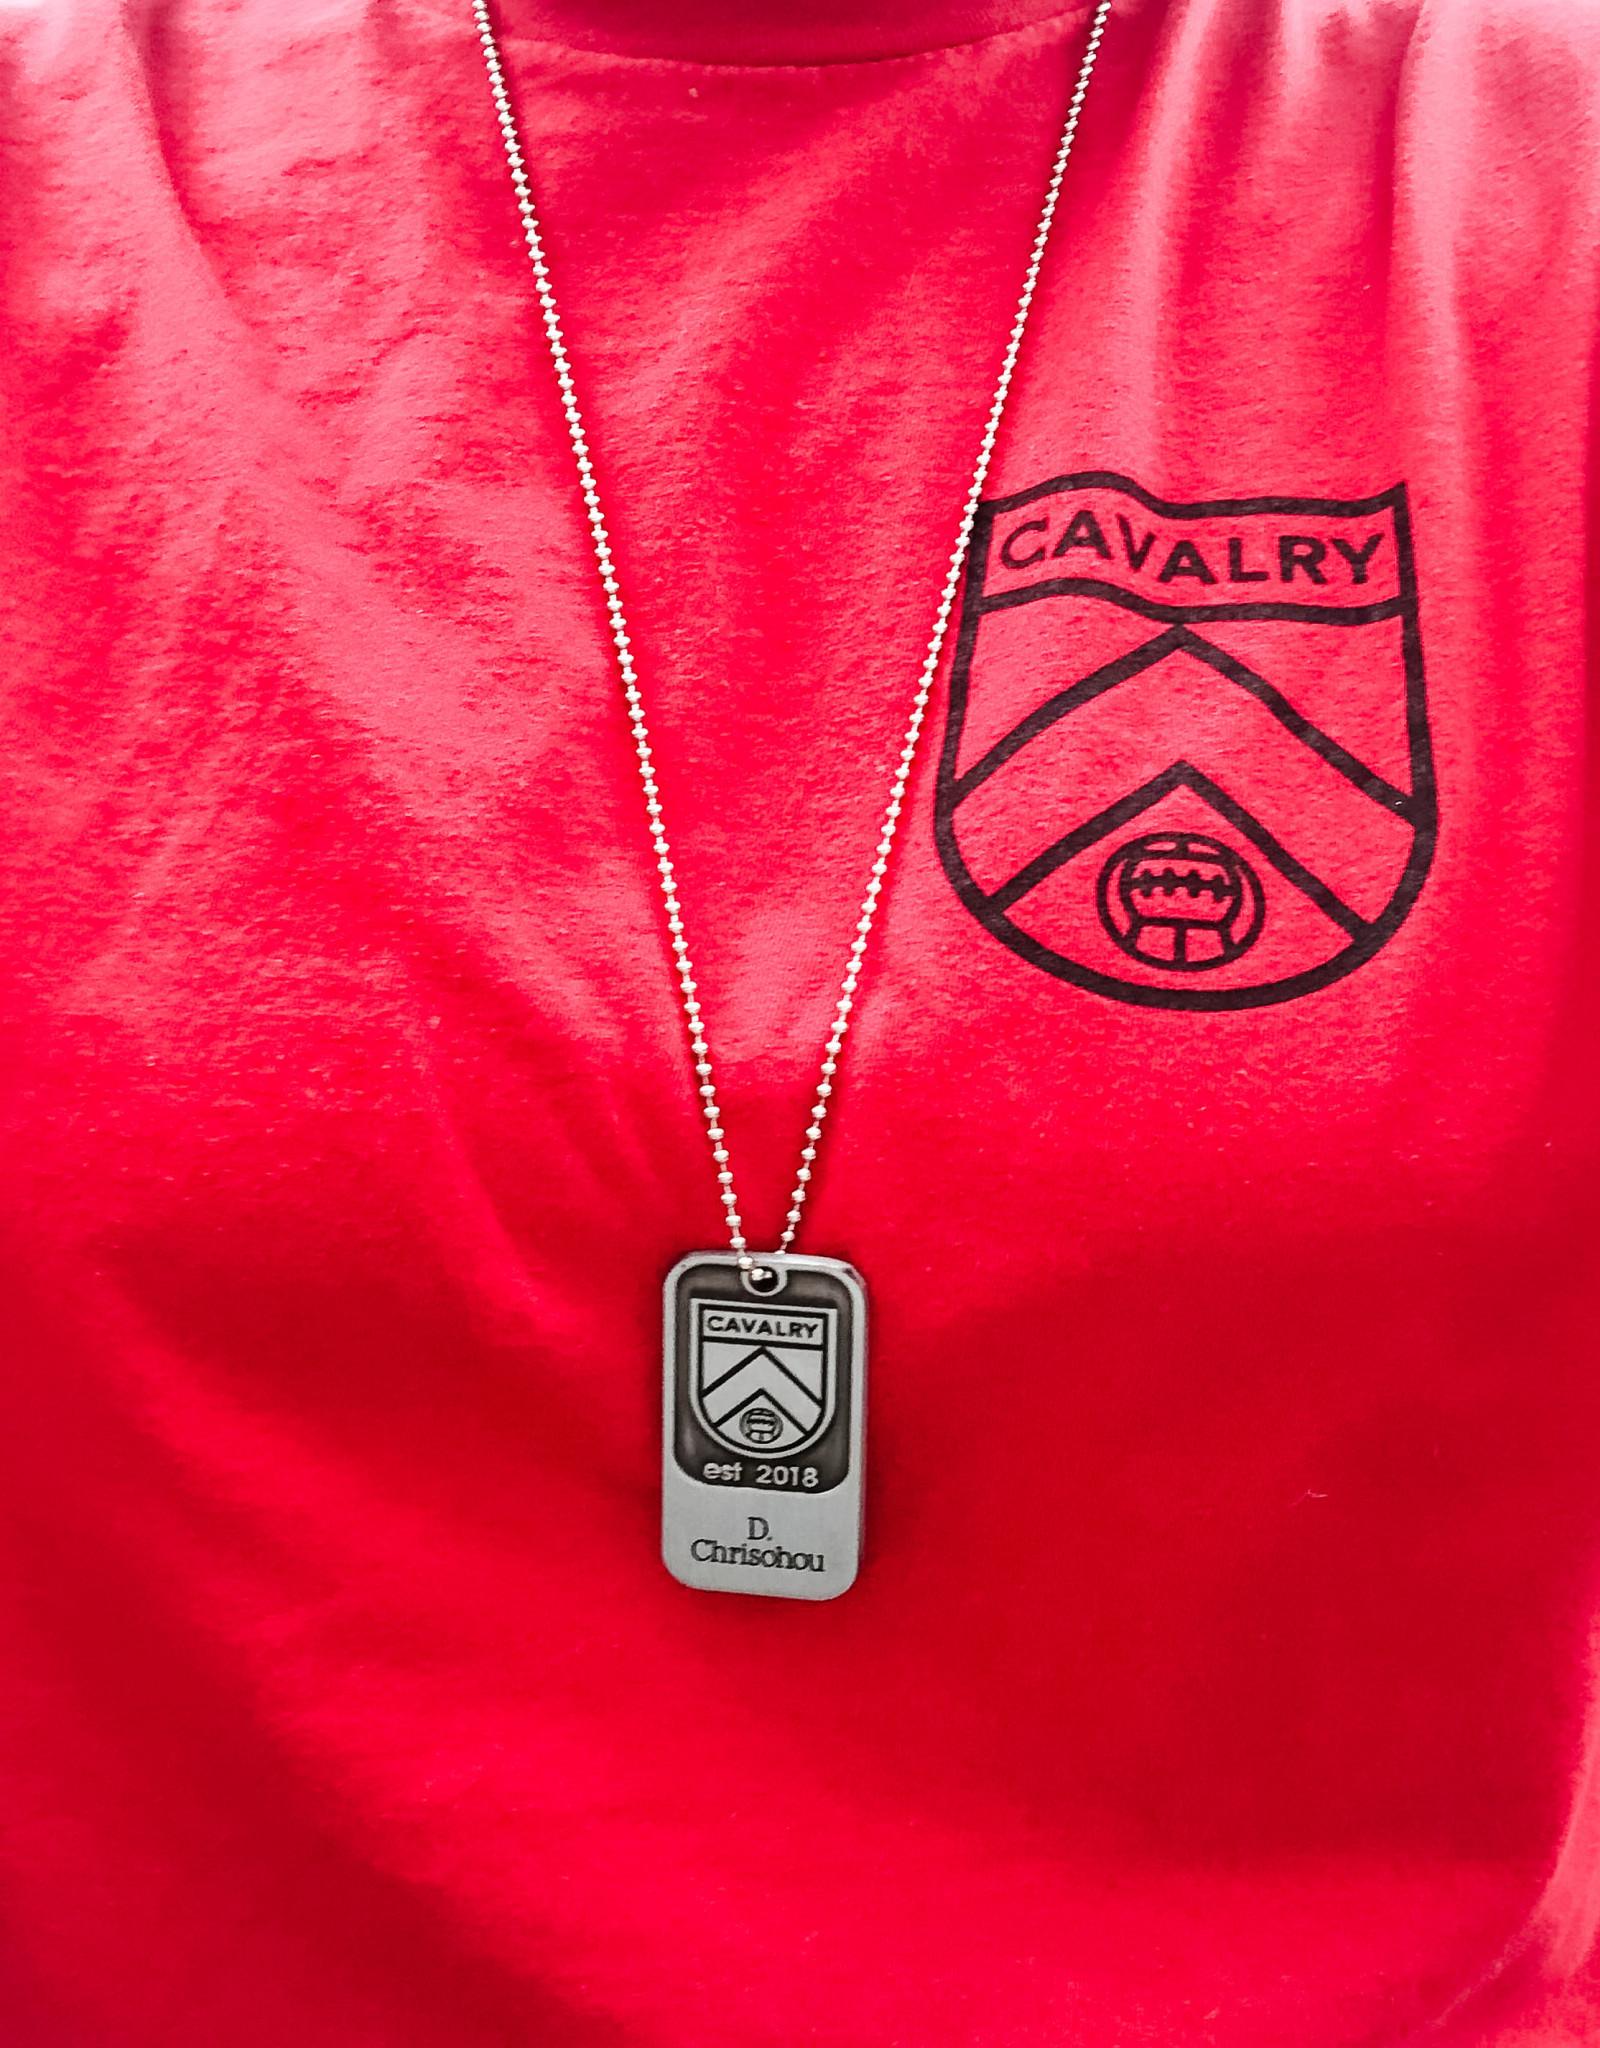 Sports Vault Cavalry FC Dog Tag